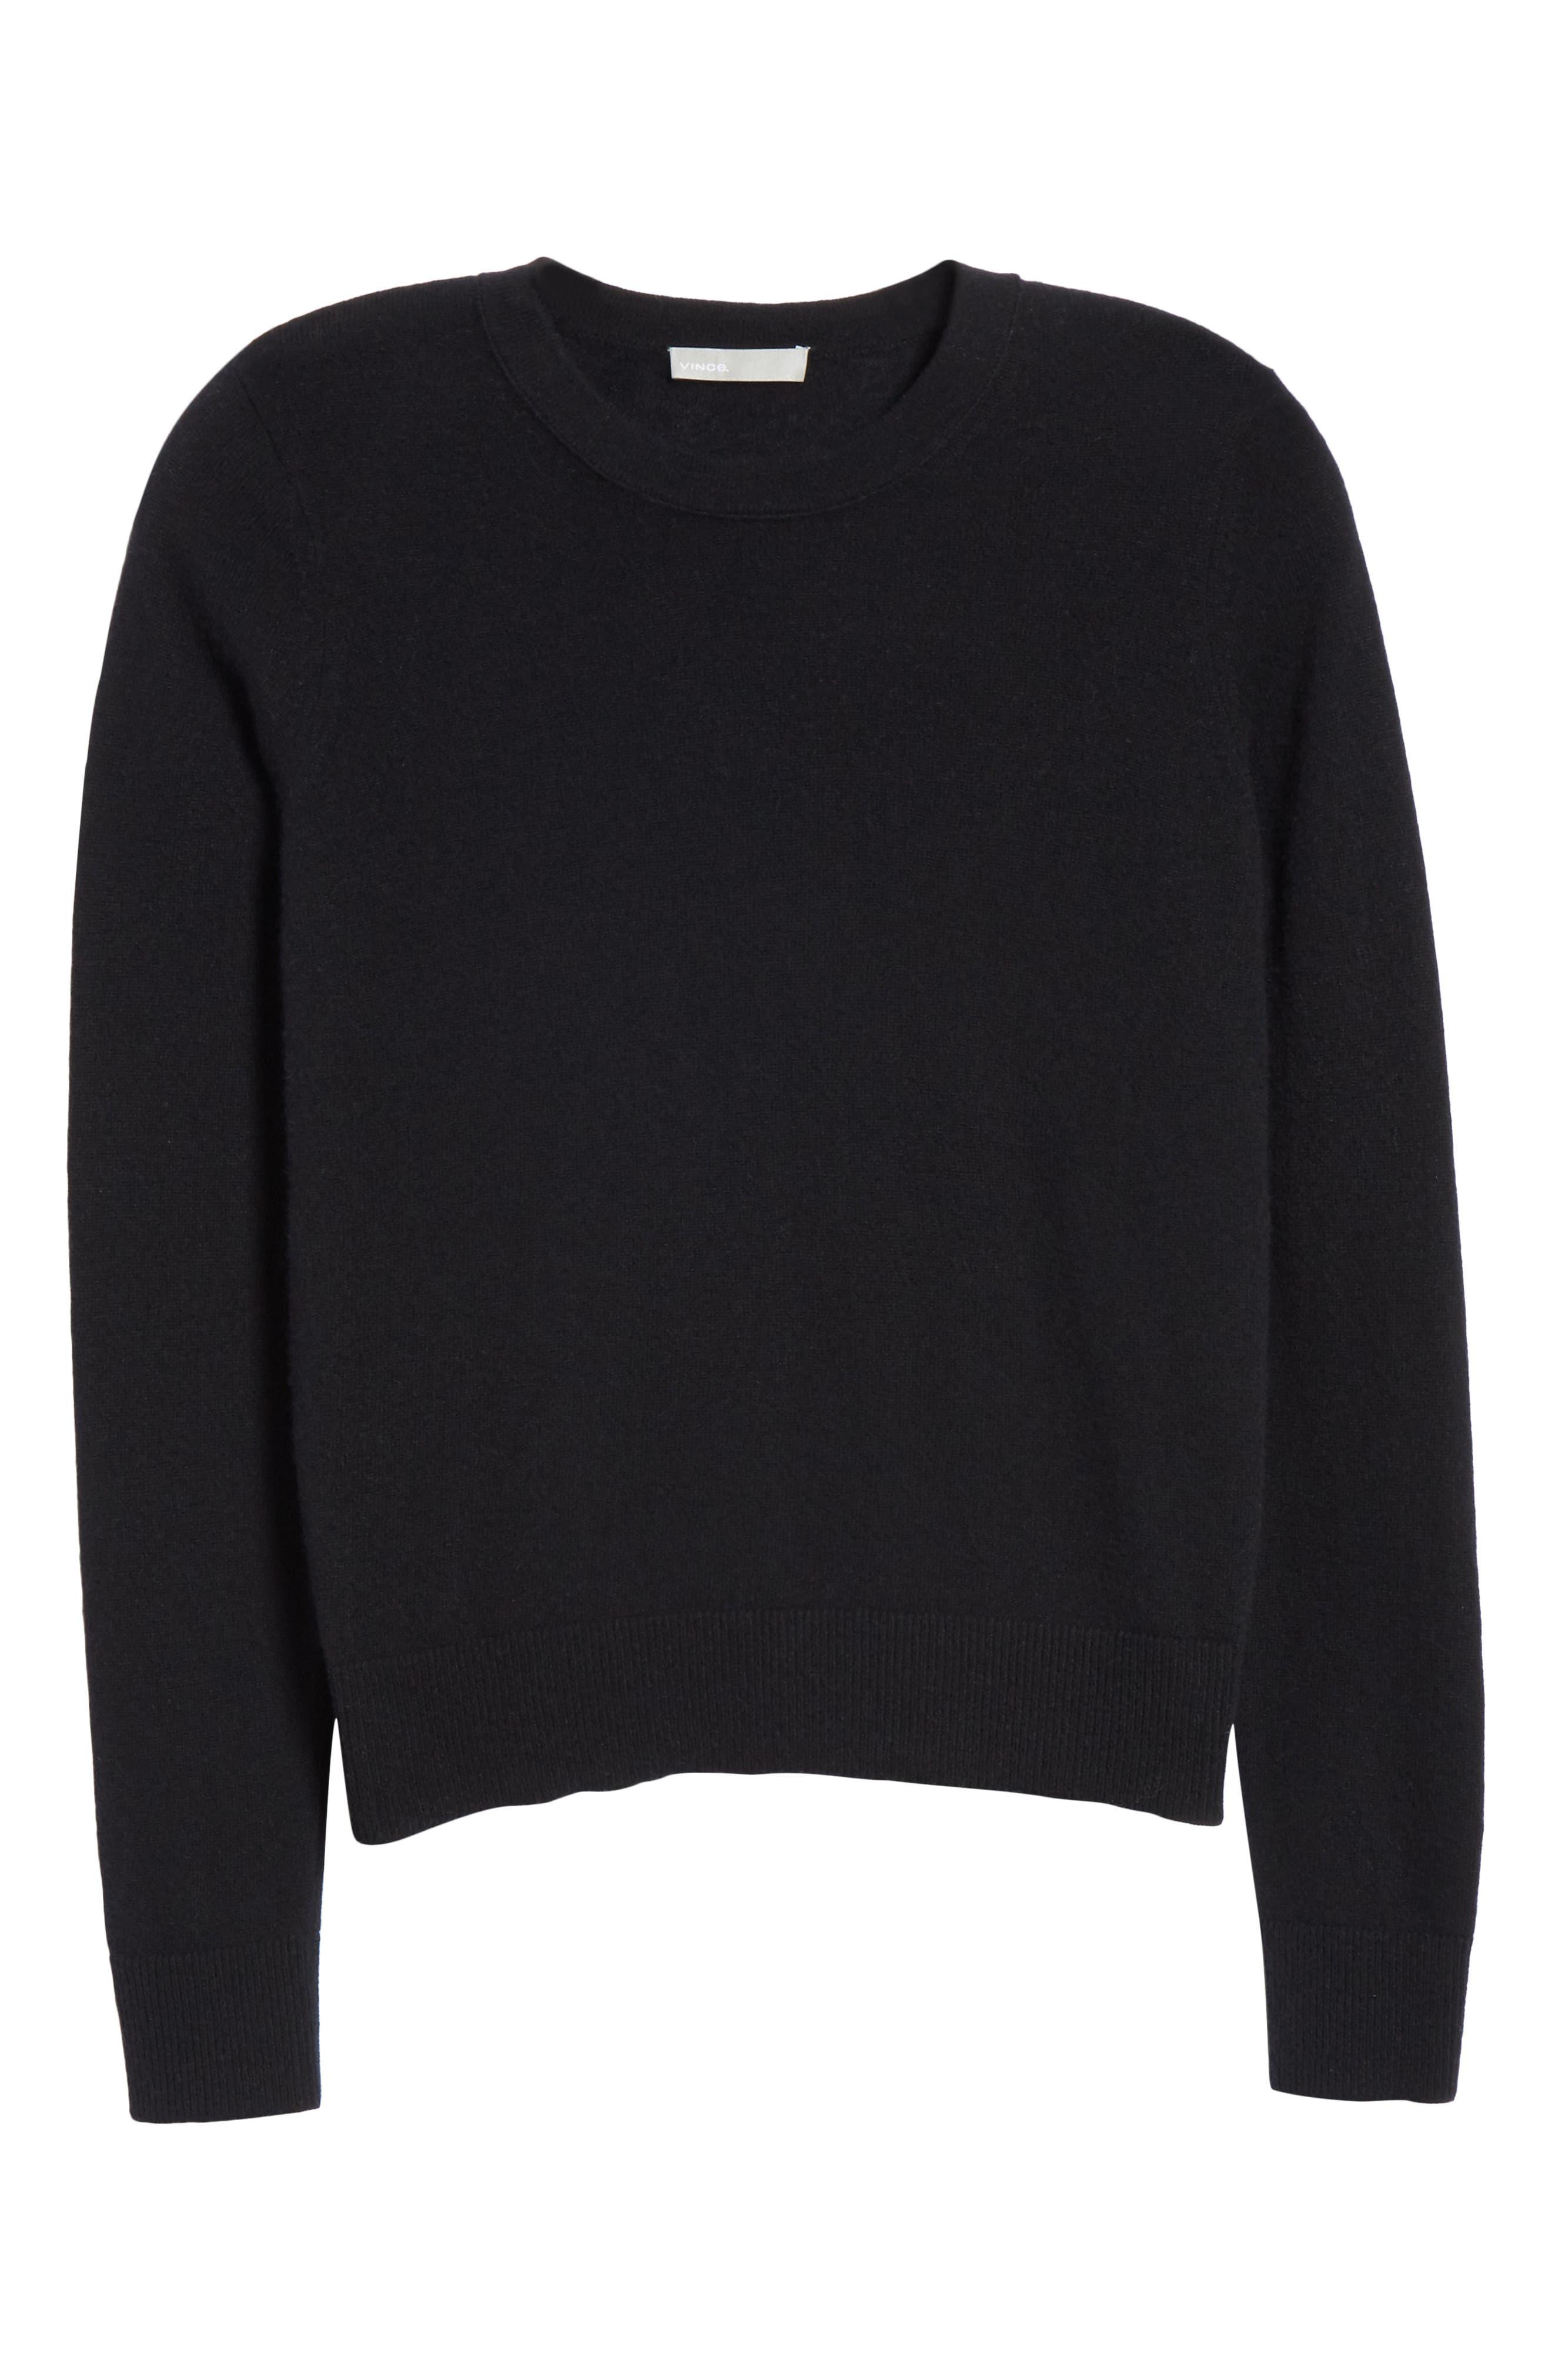 Cashmere Sweater,                             Alternate thumbnail 6, color,                             BLACK